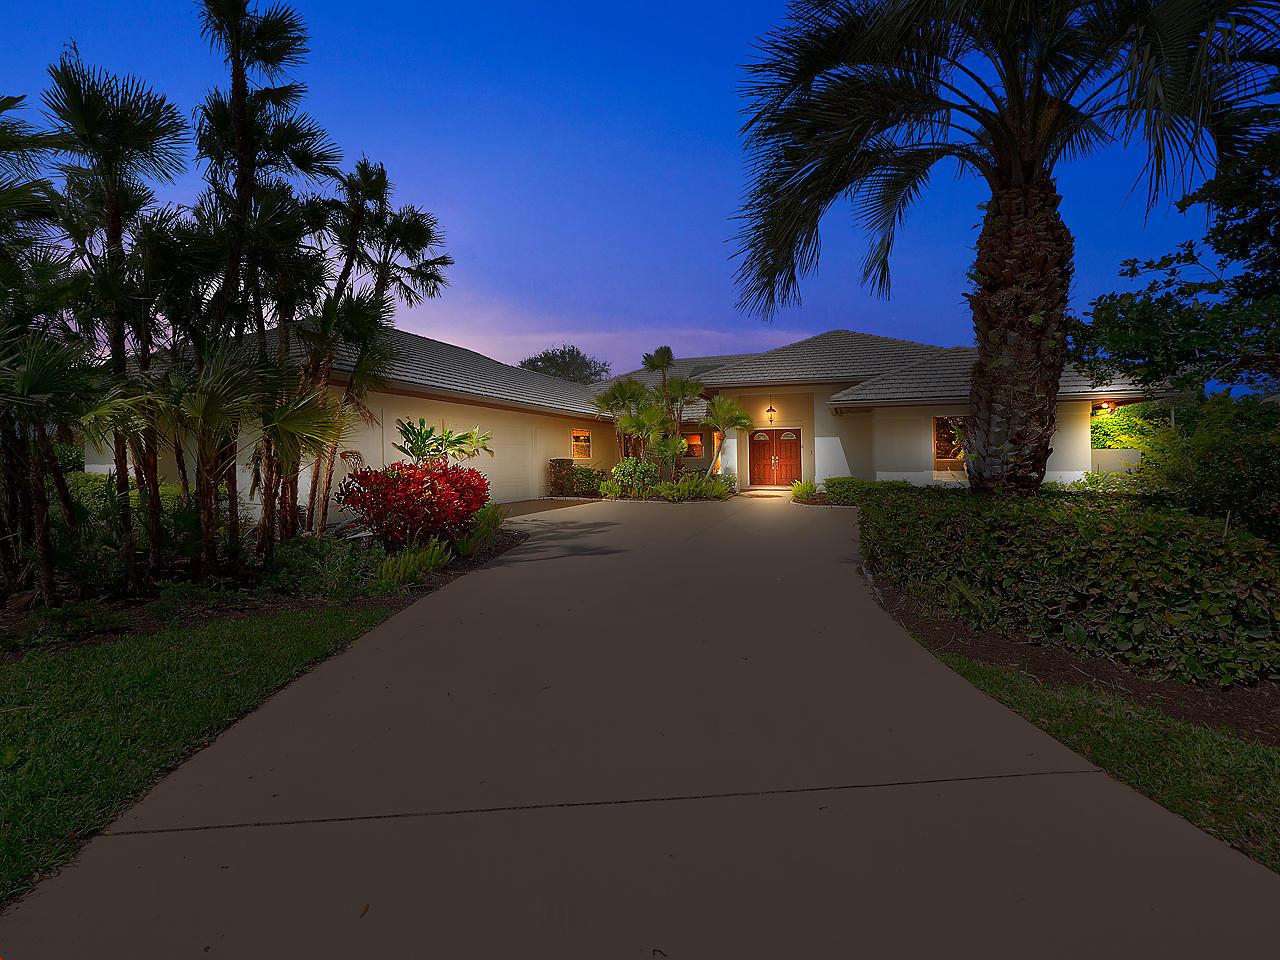 6425 Oakmont Place, Stuart, Florida 34997, 3 Bedrooms Bedrooms, ,4 BathroomsBathrooms,A,Single family,Oakmont,RX-10604385